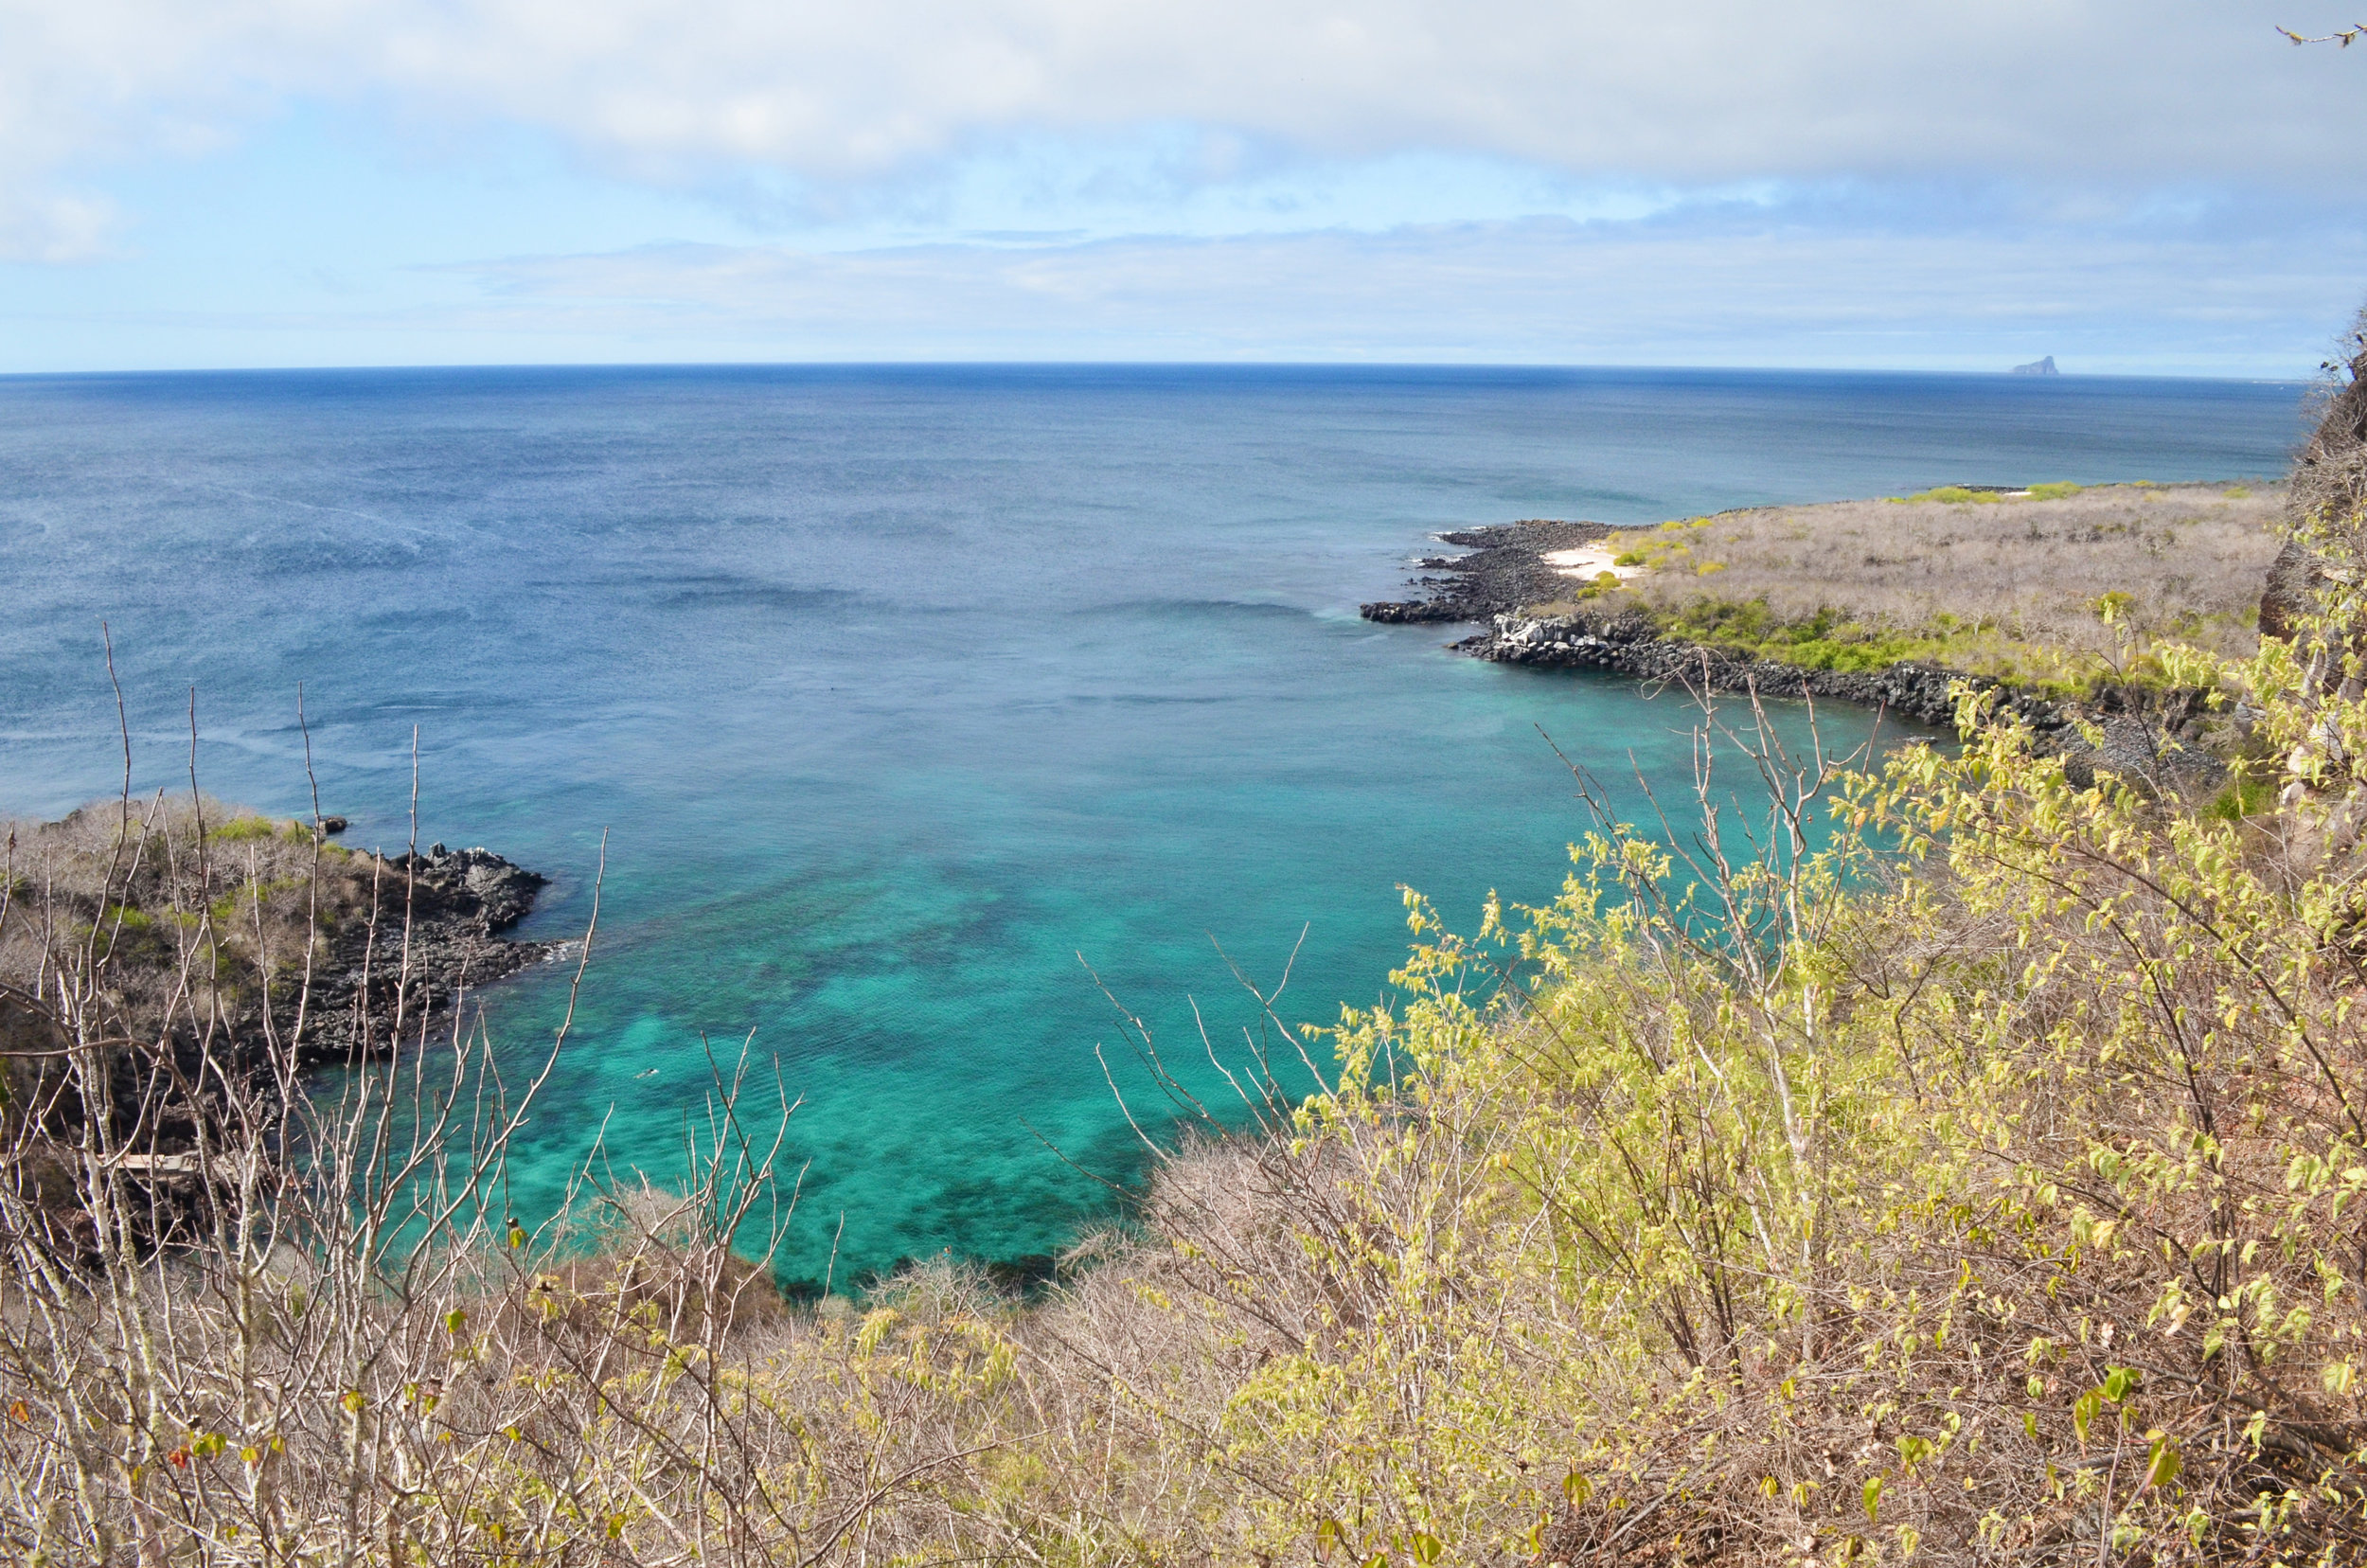 The lookout point over Tijeretas on San Cristóbal Island, with Kicker Rock on the horizon